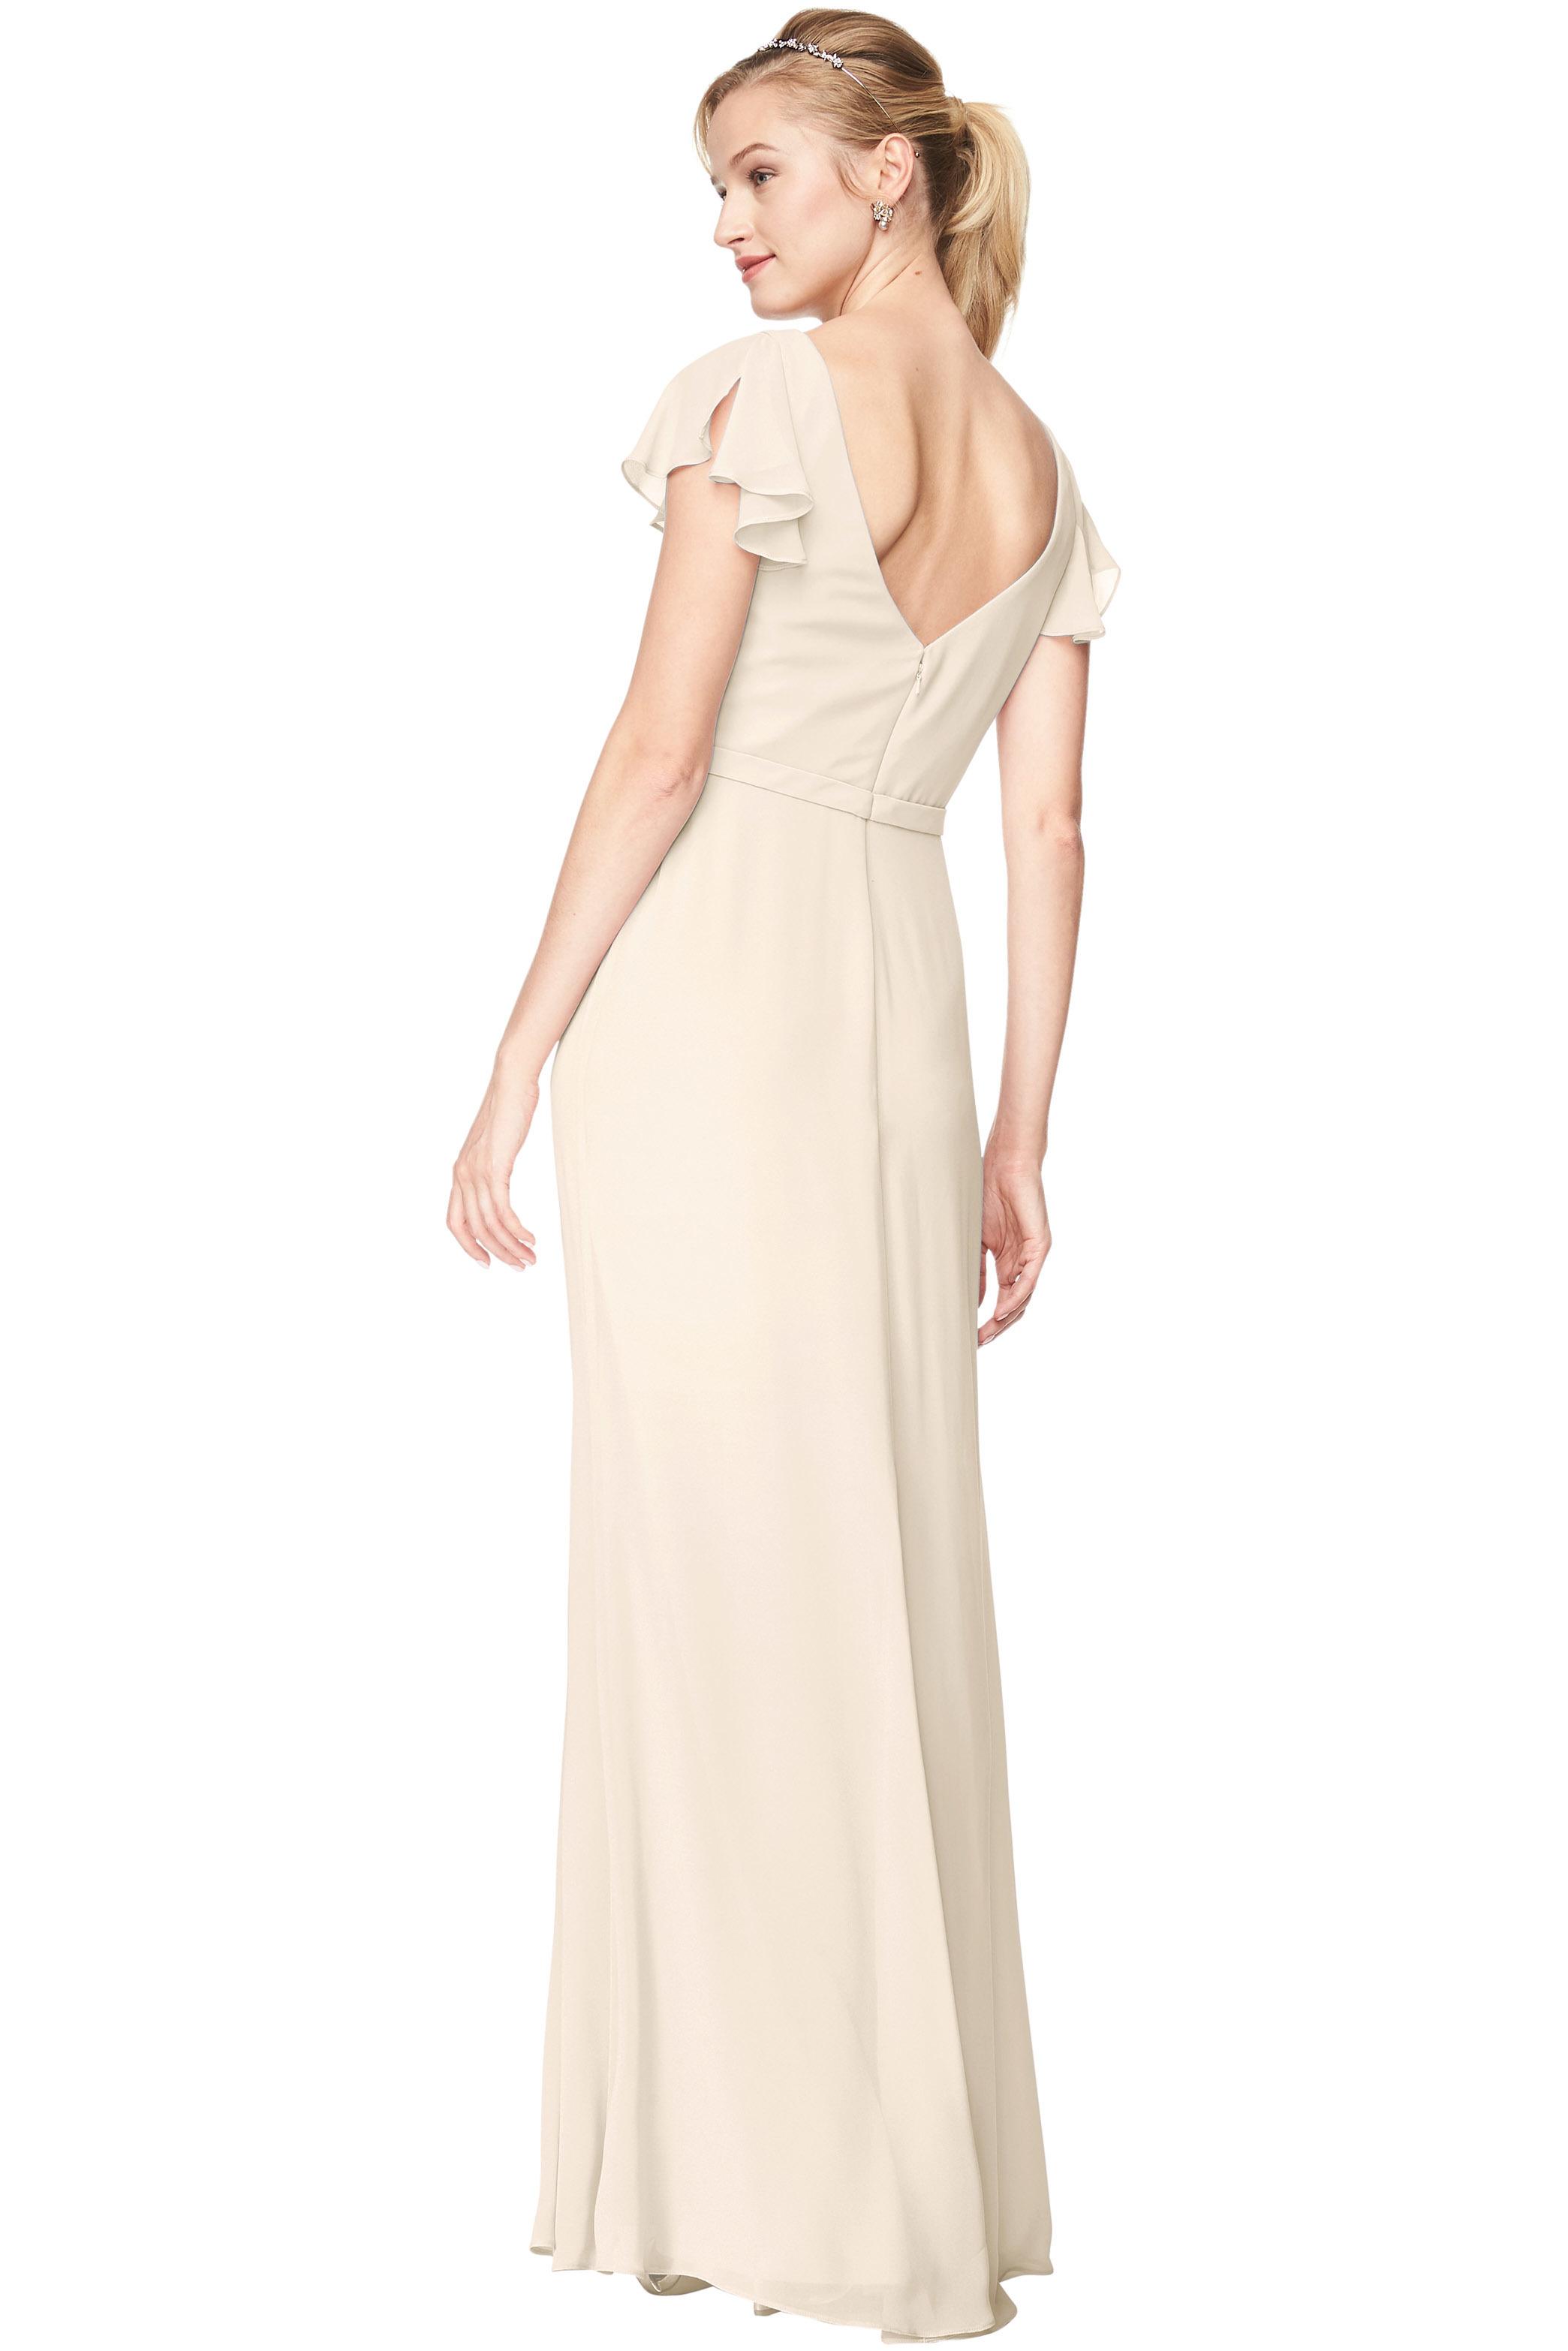 Bill Levkoff IVORY Chiffon V-Neck, Cap Sleeve A-Line gown, $184.00 Back